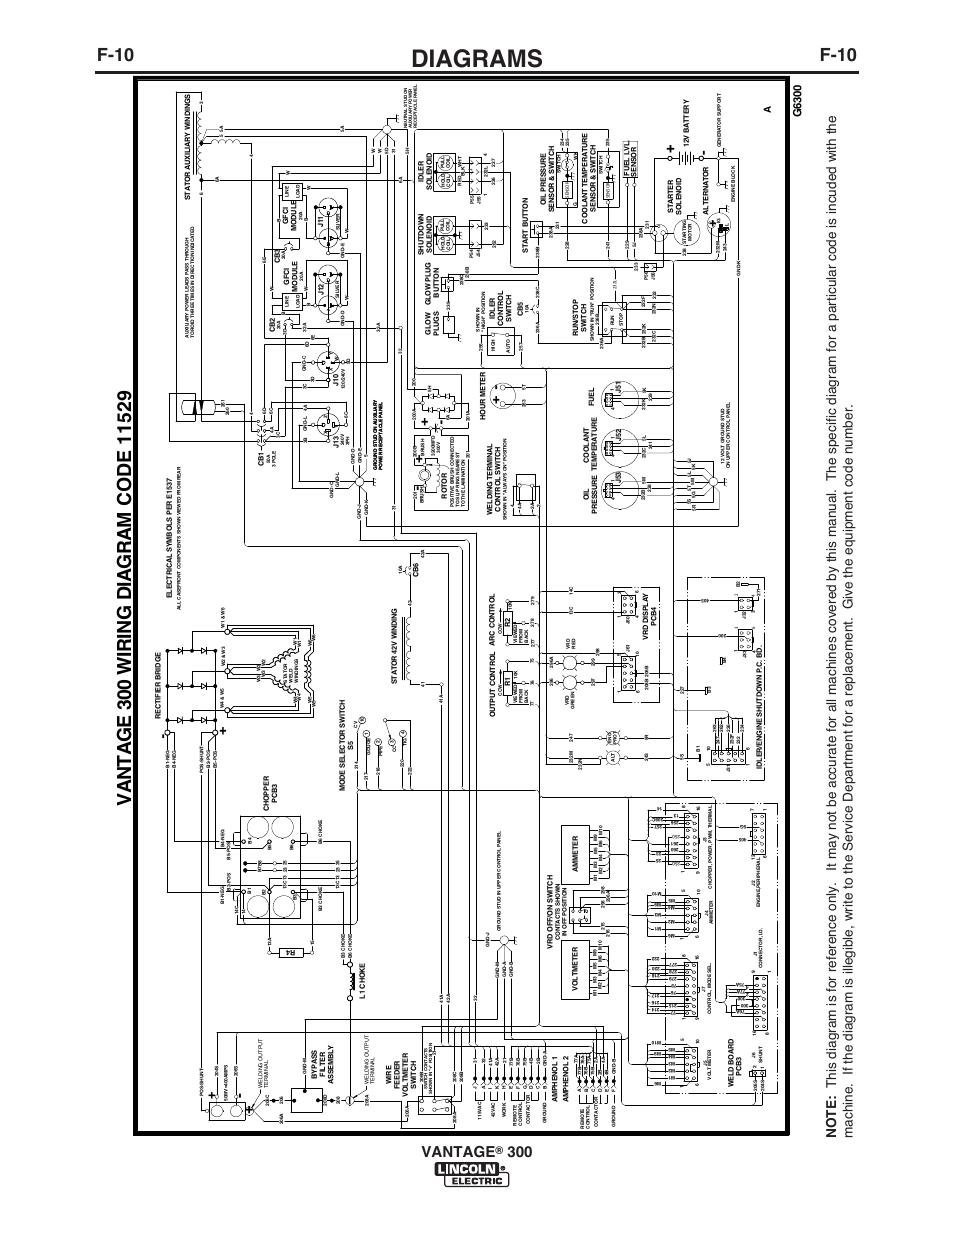 Diagrams, F-10, Vantage   Lincoln Electric IM993 VANTAGE 300 User Manual    Page 49 / 54